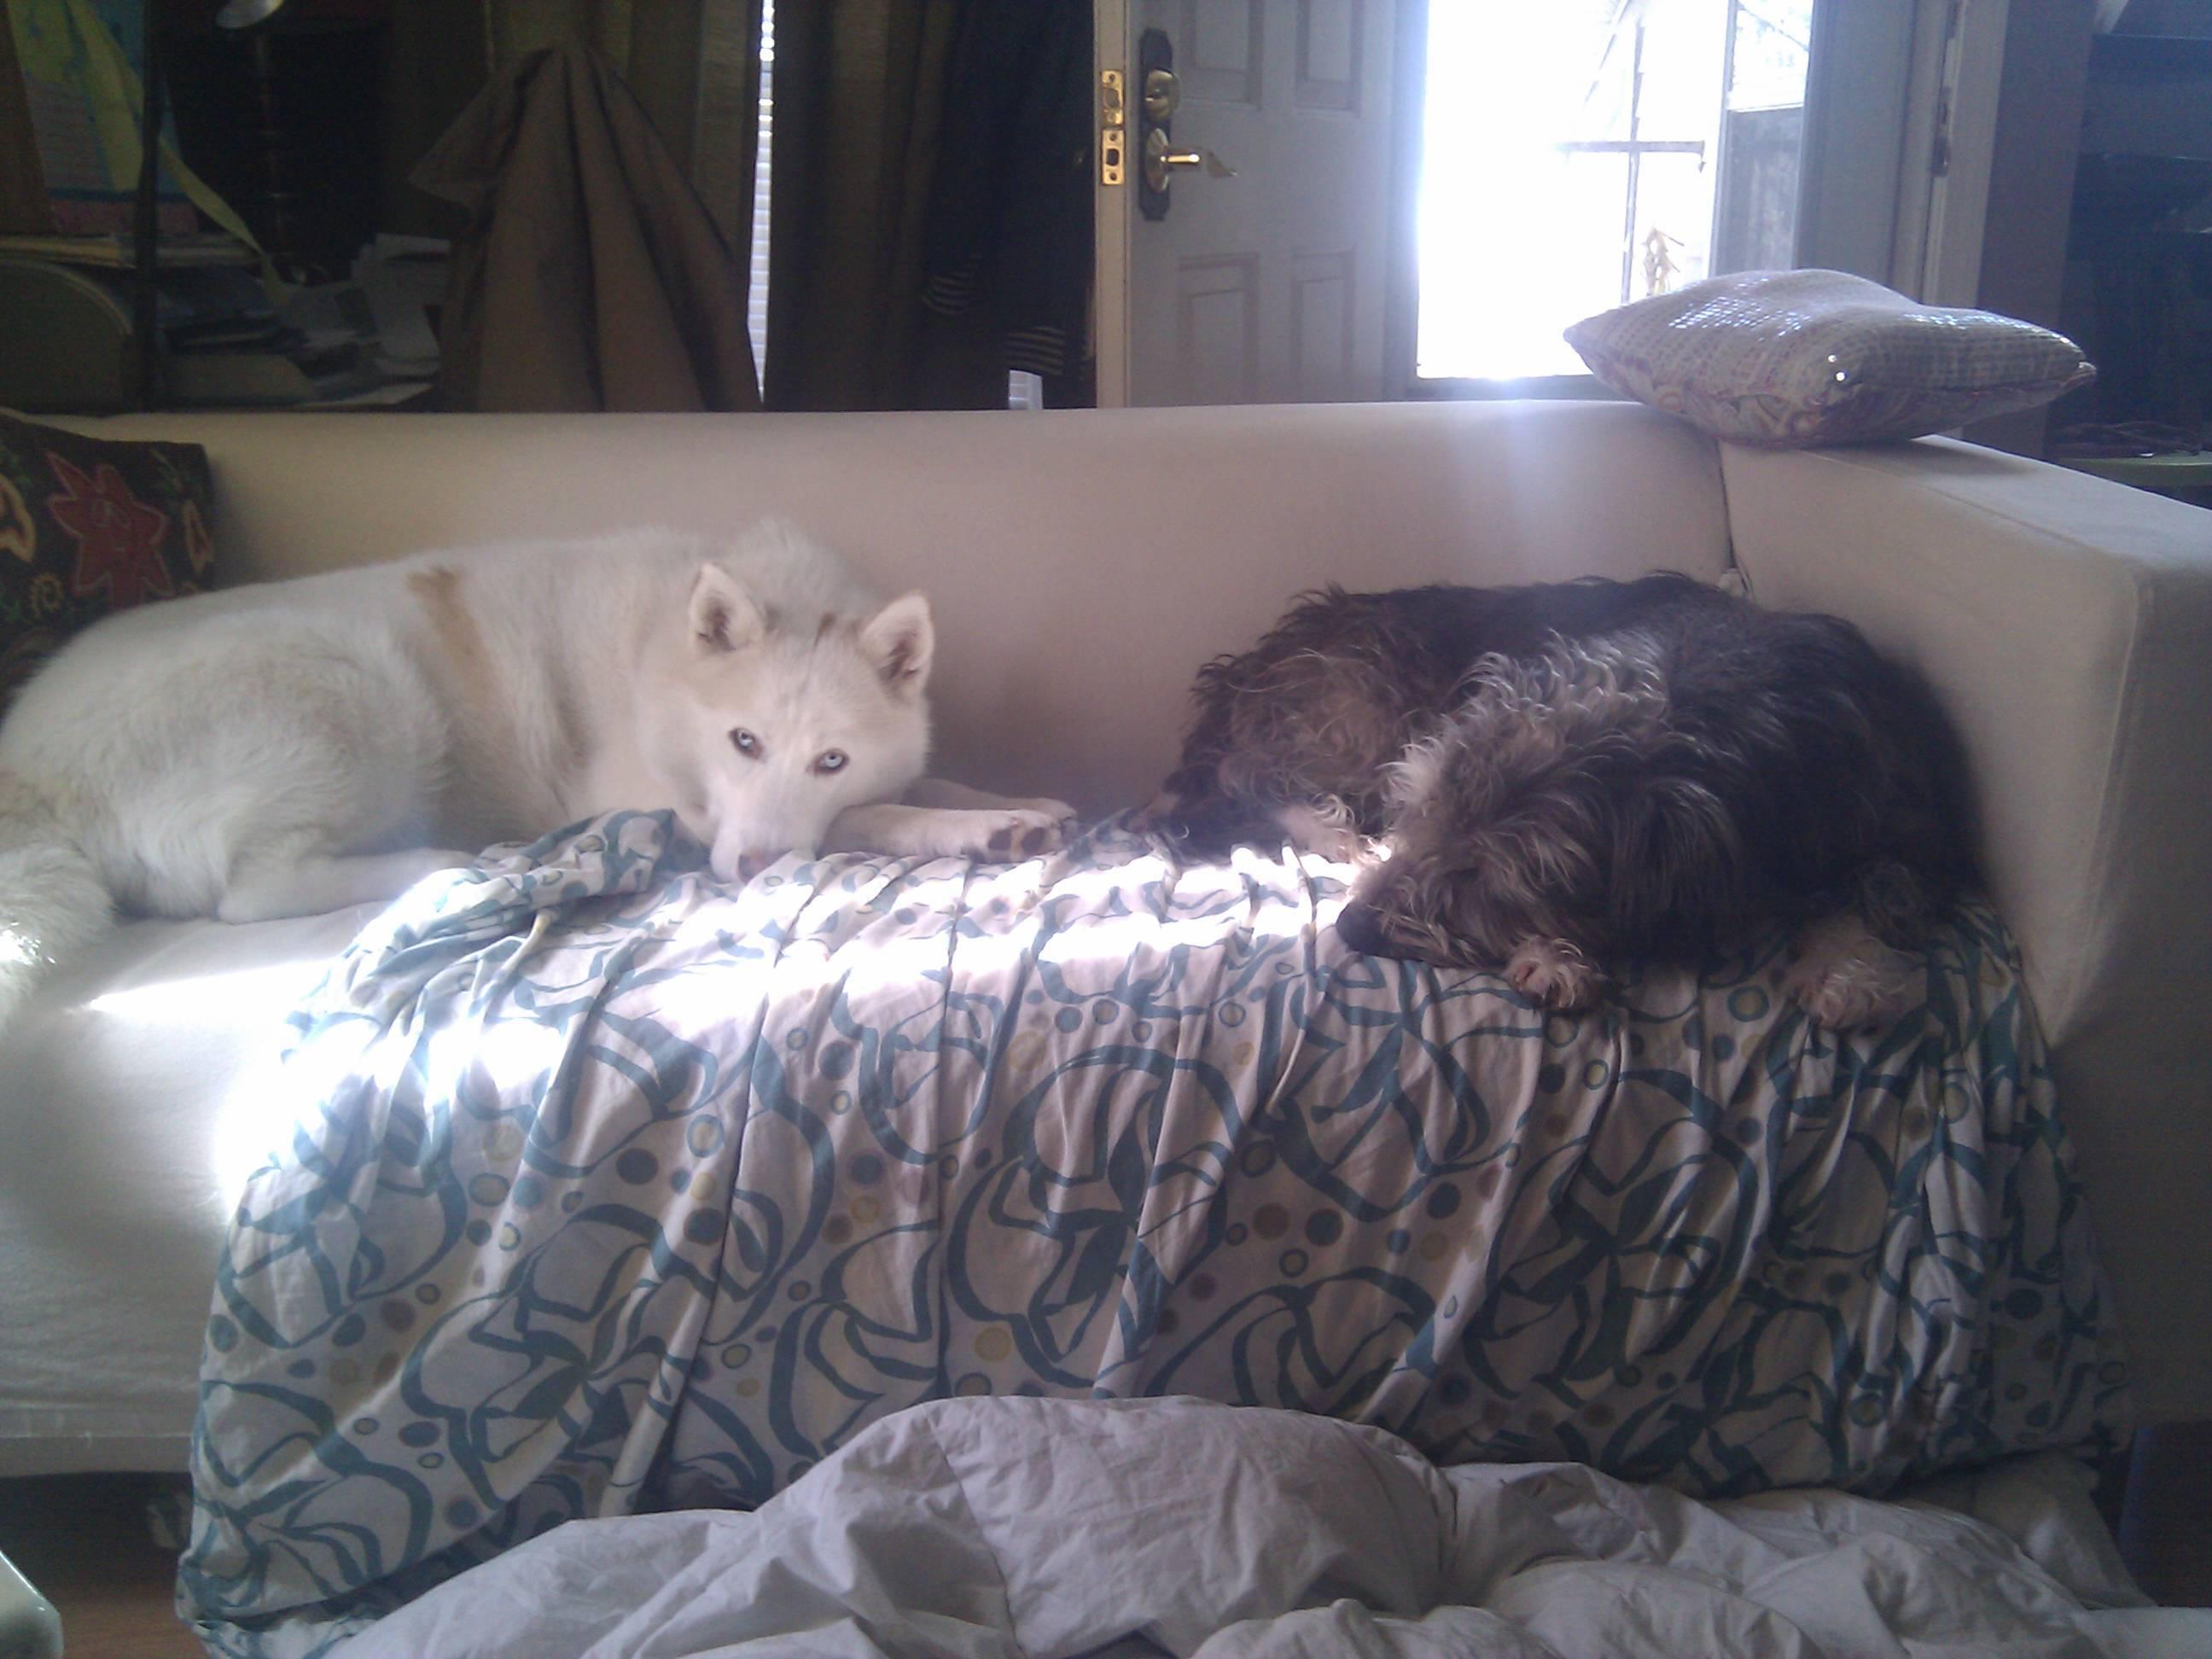 Gracie and Odin FKA Morgan